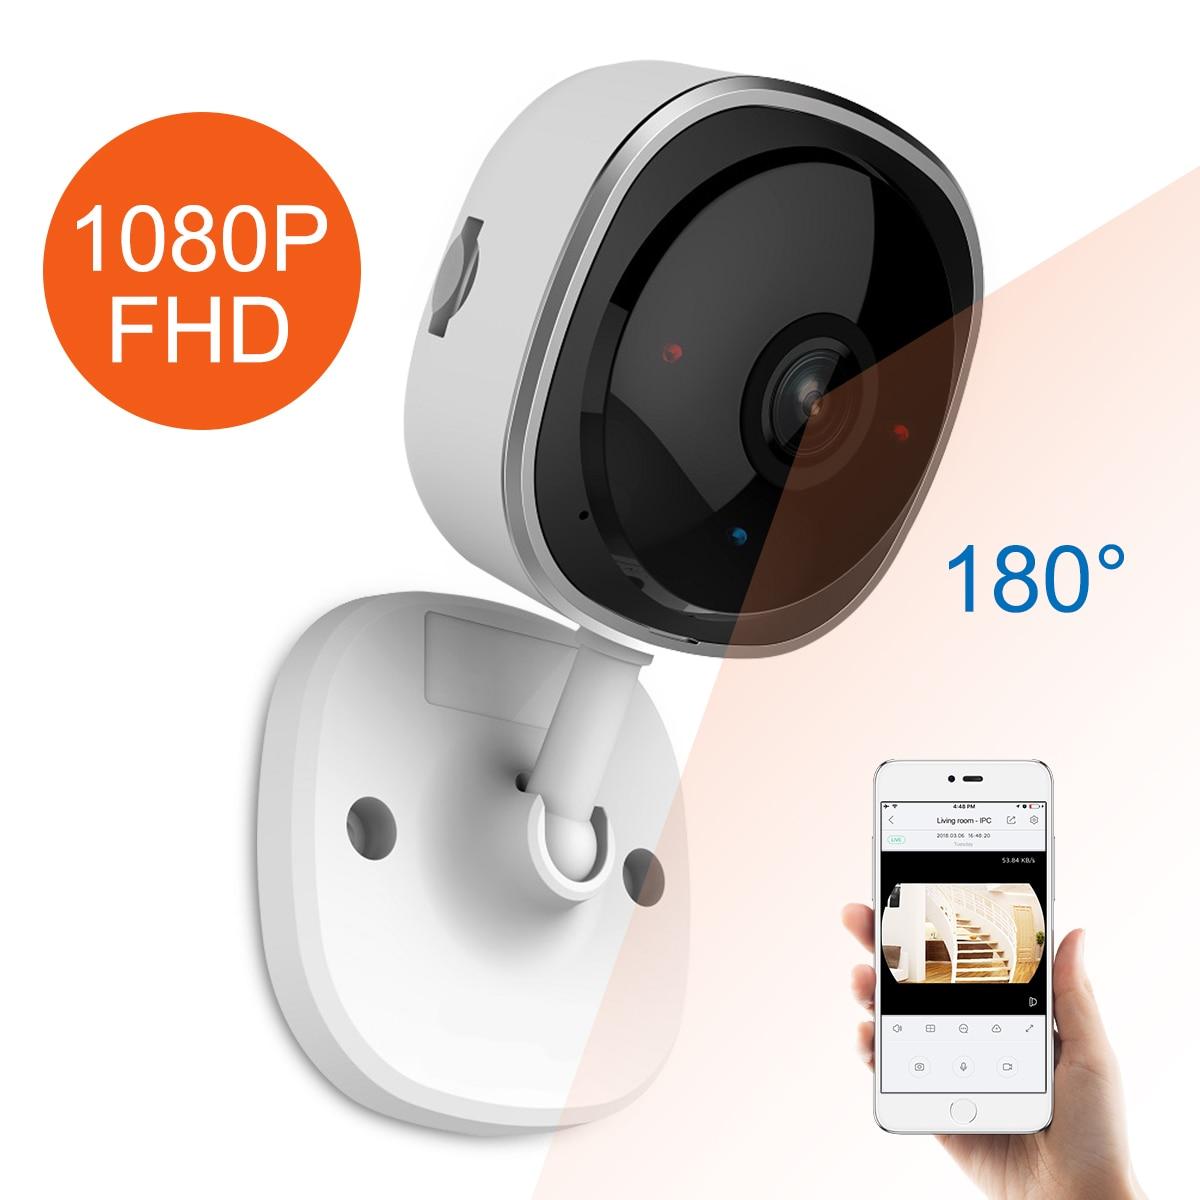 SANNCE HD 1080 p Fisheye IP Kamera Wireless Wifi Mini Netzwerk Camara Nachtsicht IR Cut Home Security Camara Wi-Fi baby Monitor